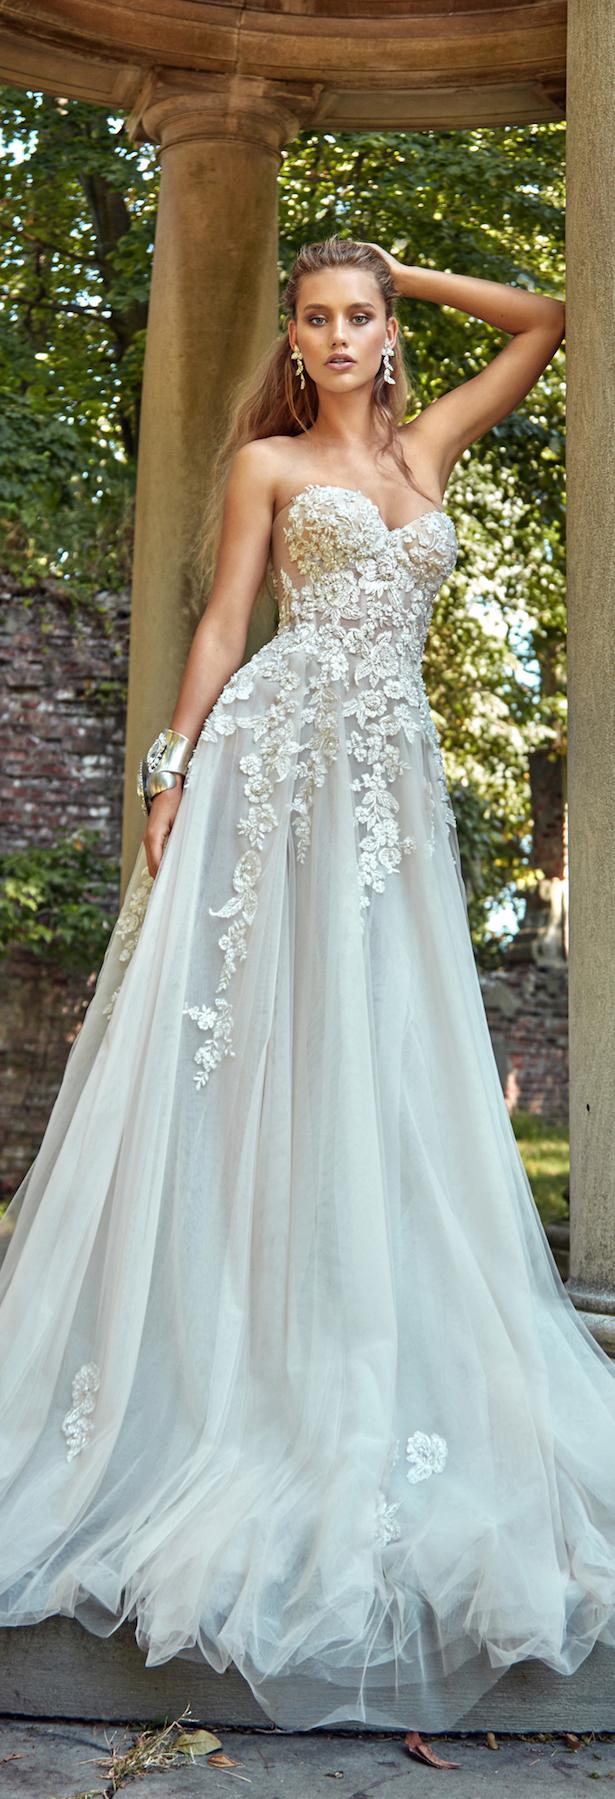 Secret Garden: Galia Lahav 2017 Bridal Collection: Le Secret Royal II